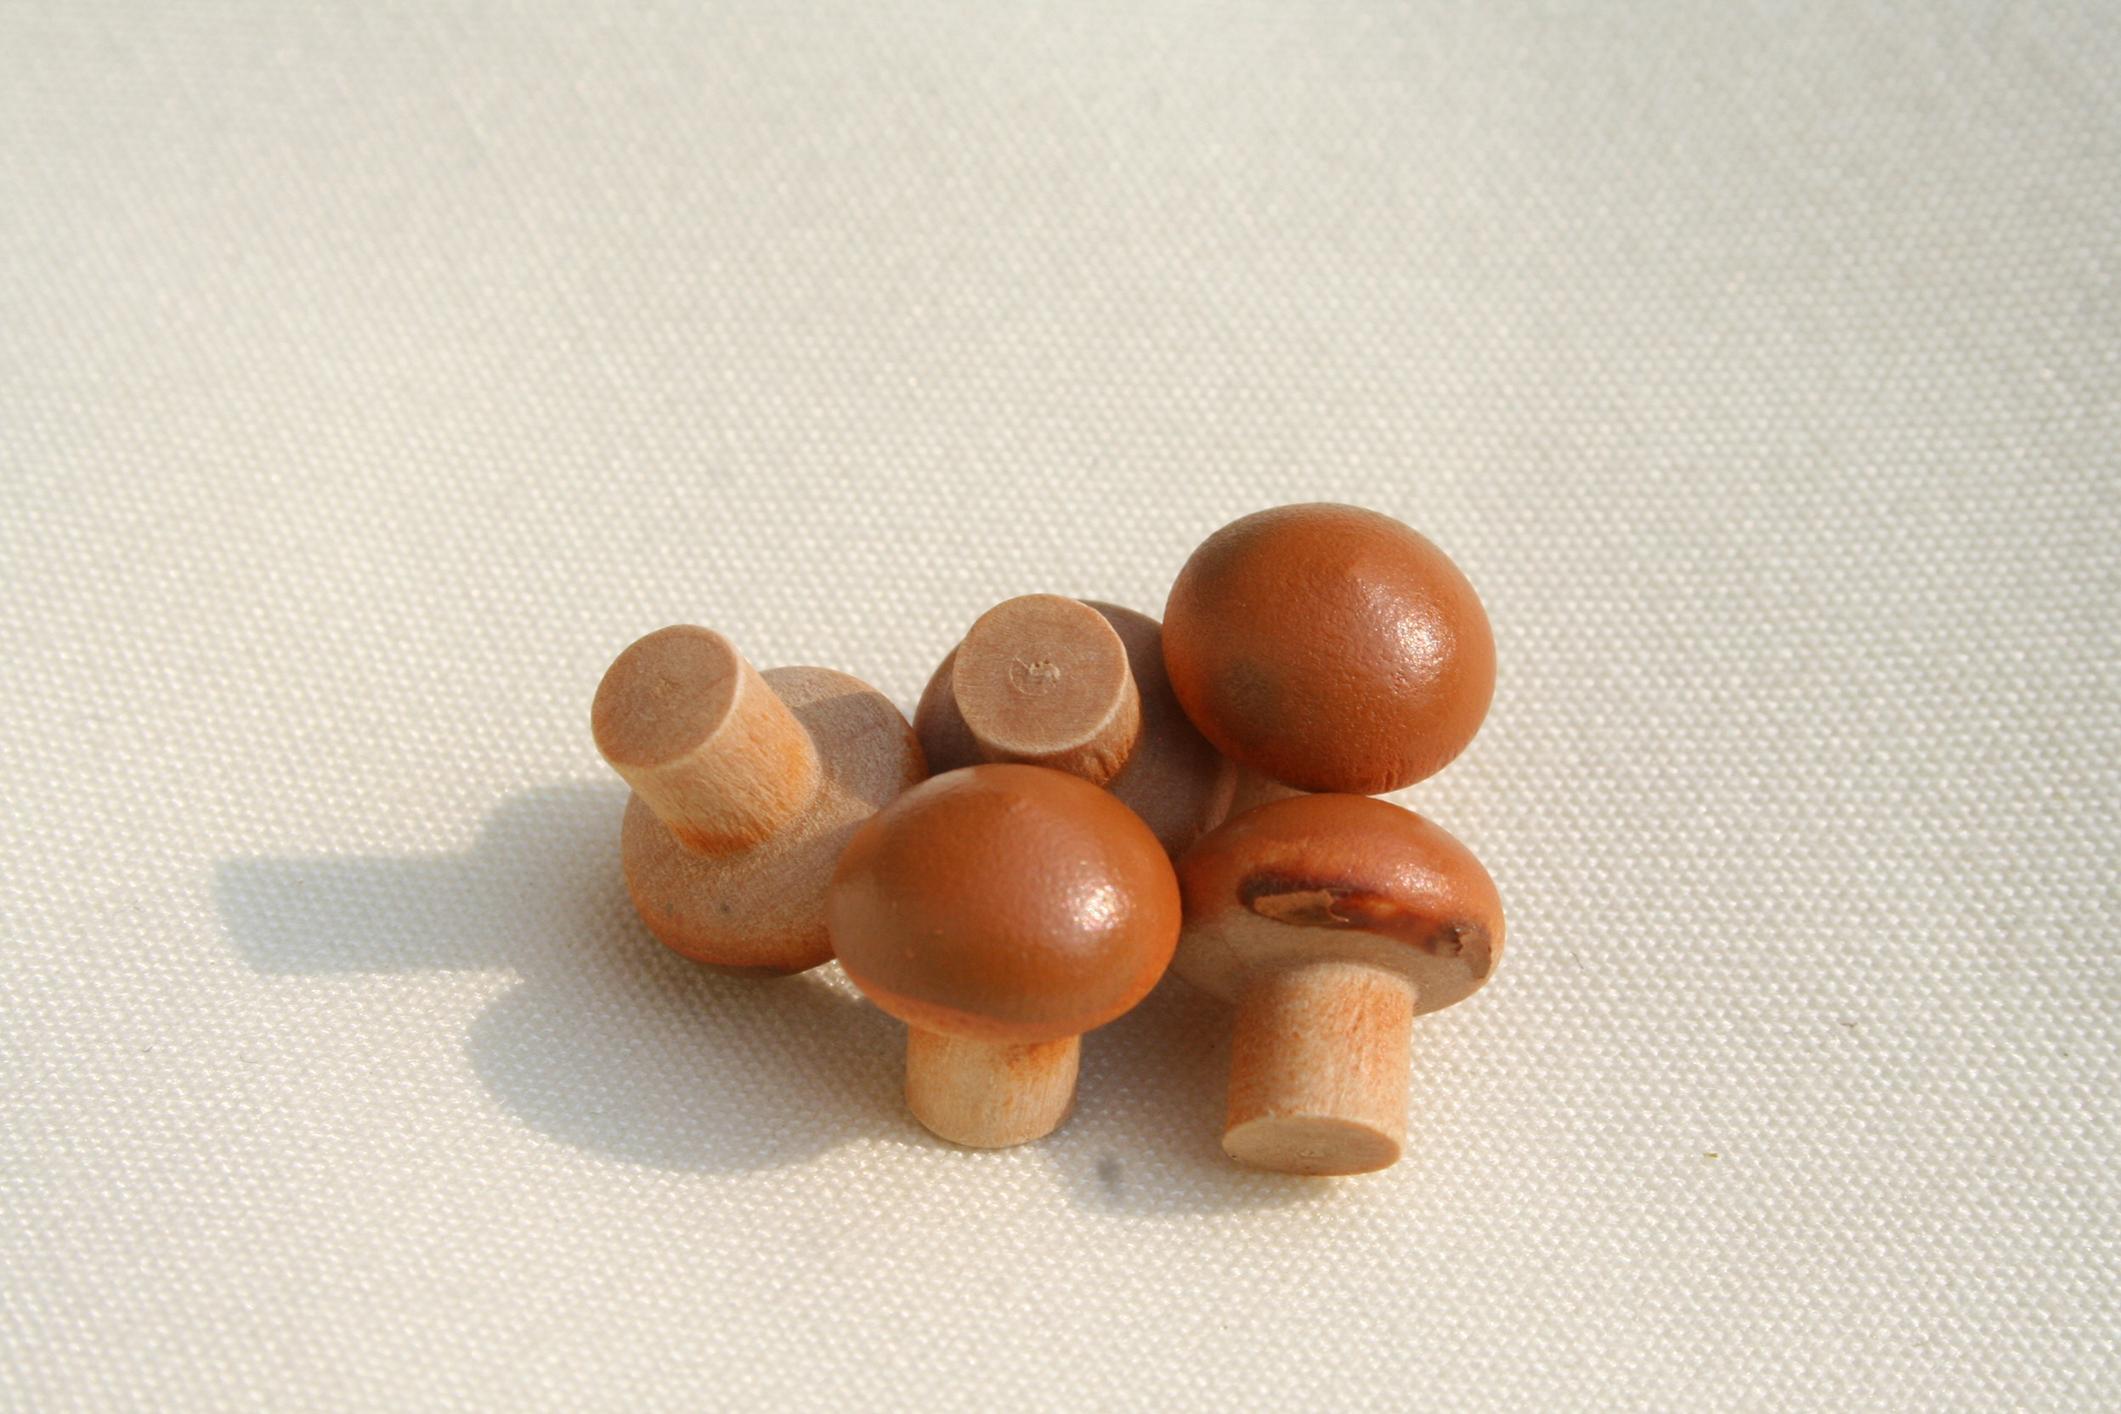 wurzelkrippe krippenhobby onlineshop k 199 pilze miniaturpilze aus holz t te mit 5 st ck. Black Bedroom Furniture Sets. Home Design Ideas